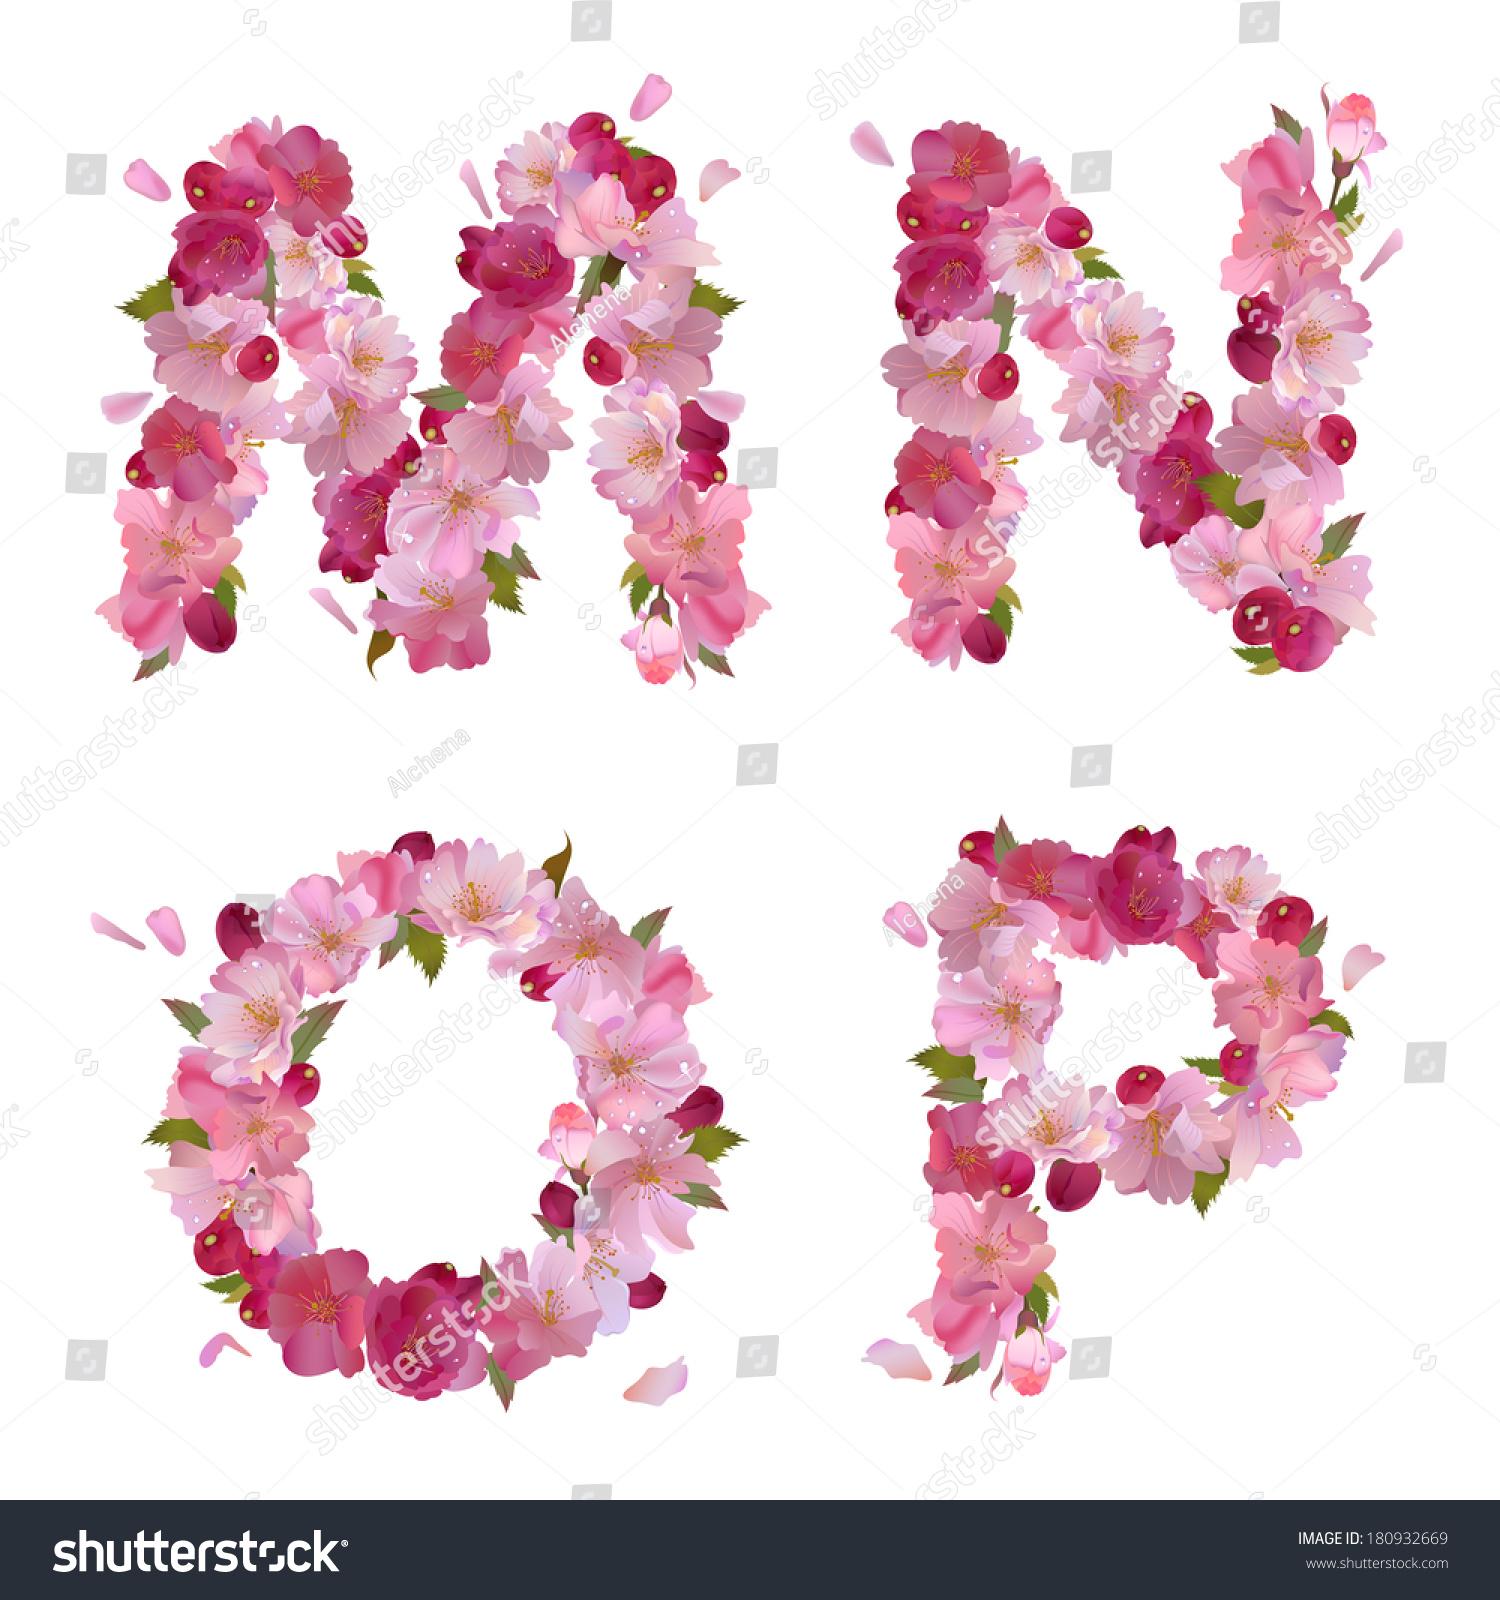 Spring alphabet gentle pink sakura flowers stock illustration spring alphabet with gentle pink sakura flowers letters mnop dhlflorist Images